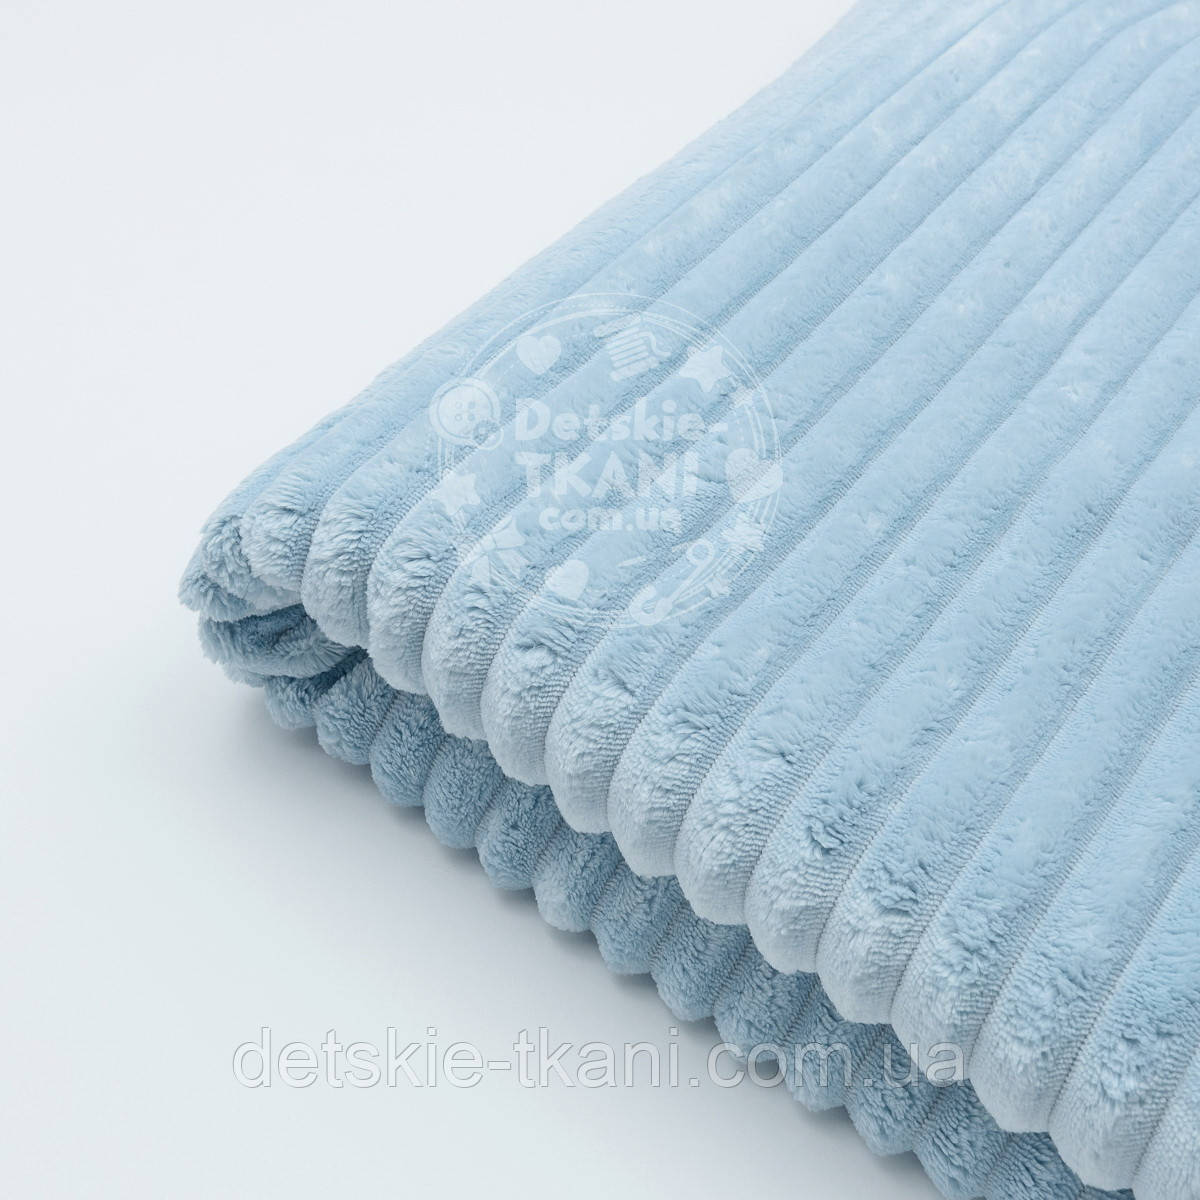 "Отрез плюша в полоску ""Stripes"" размером 100*80 см бледно-голубого цвета"